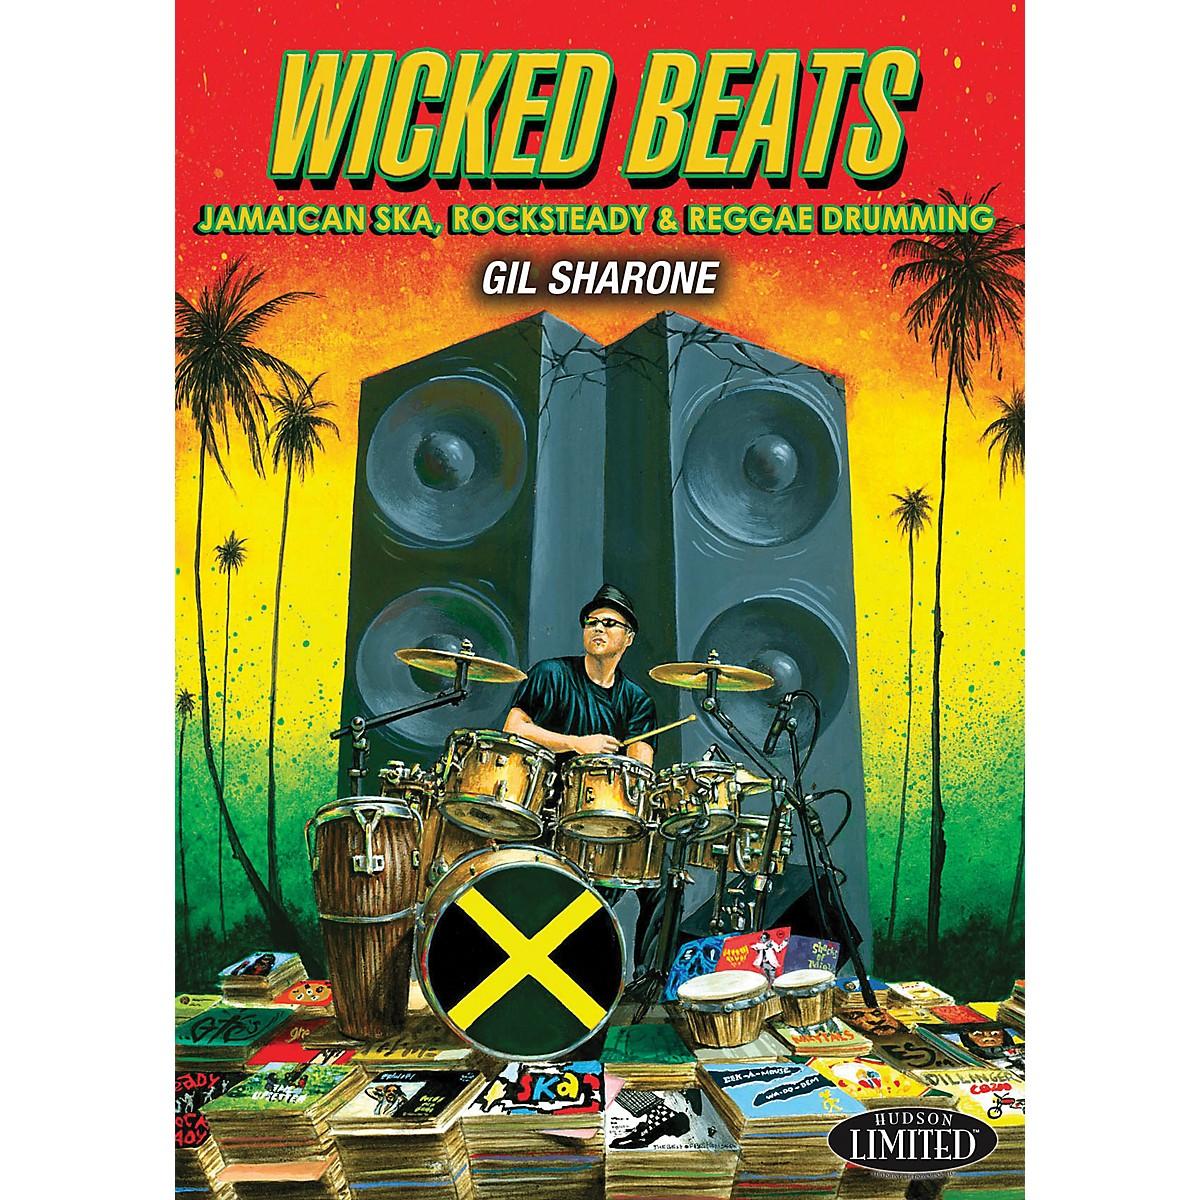 Hudson Music Wicked Beats - Jamaican Ska Rocksteady & Reggae Drumming DVD With Gil Sharone